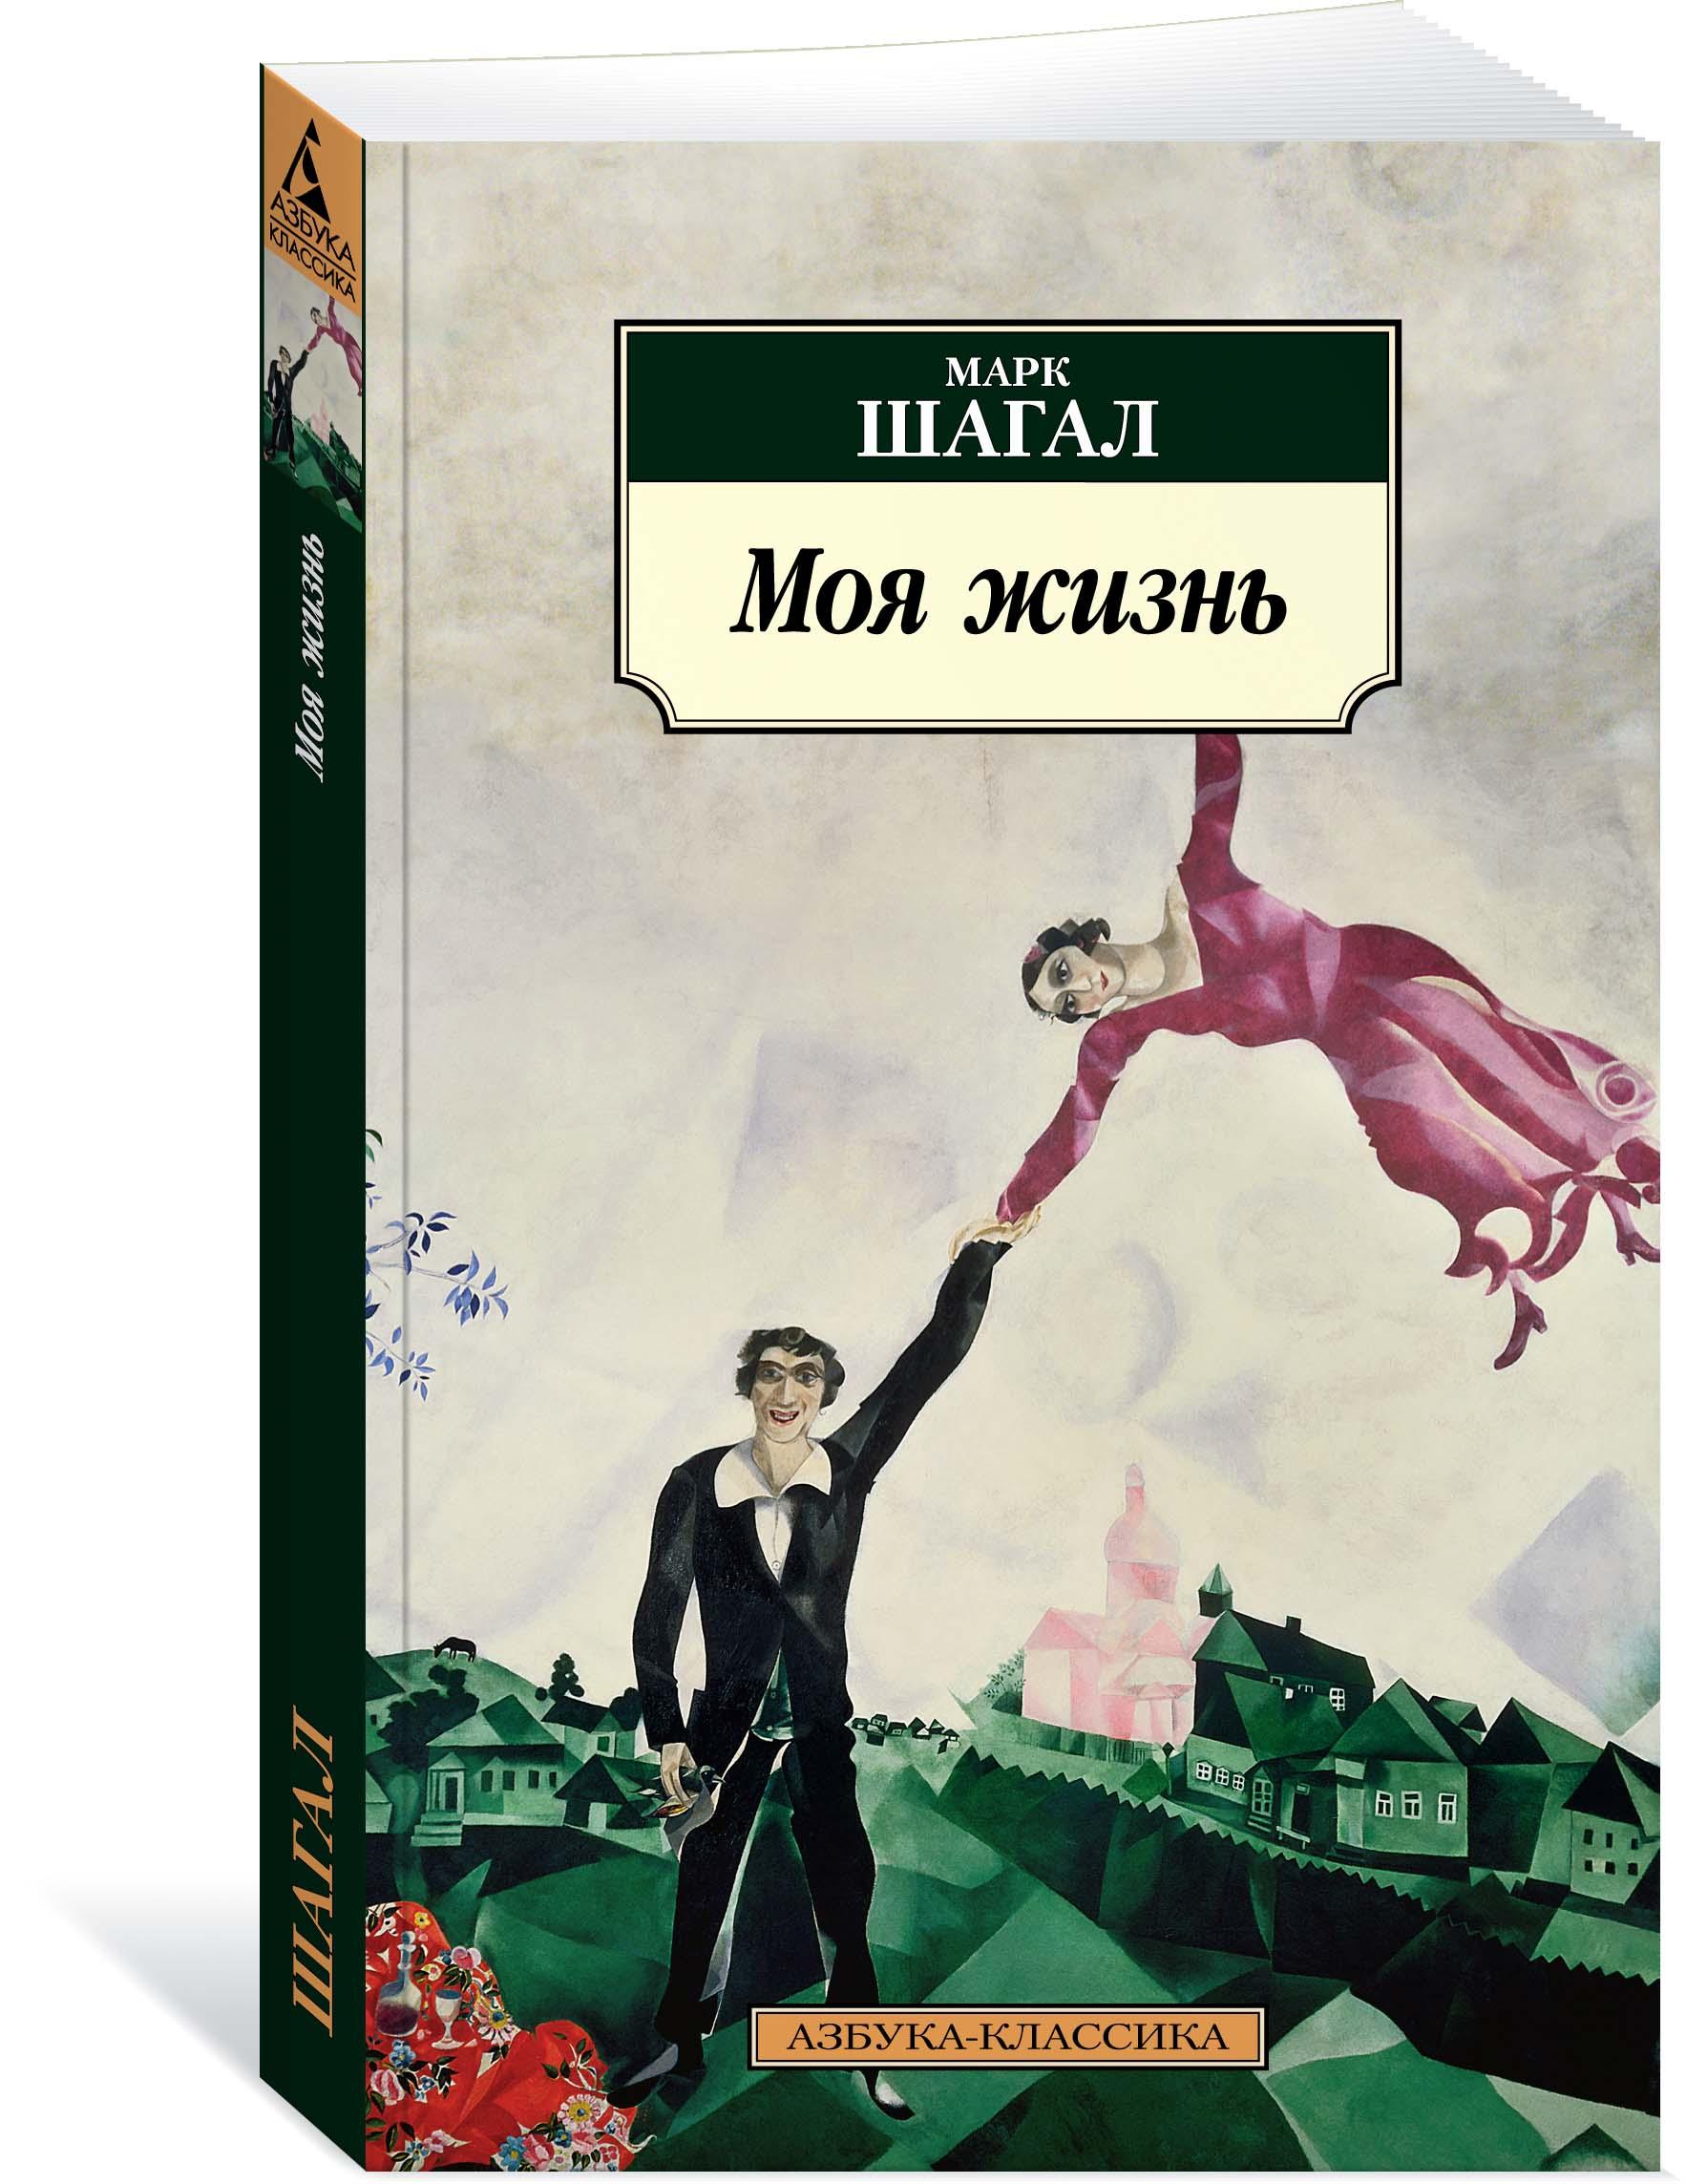 Марк Шагал Моя жизнь коровин константин алексеевич моя жизнь